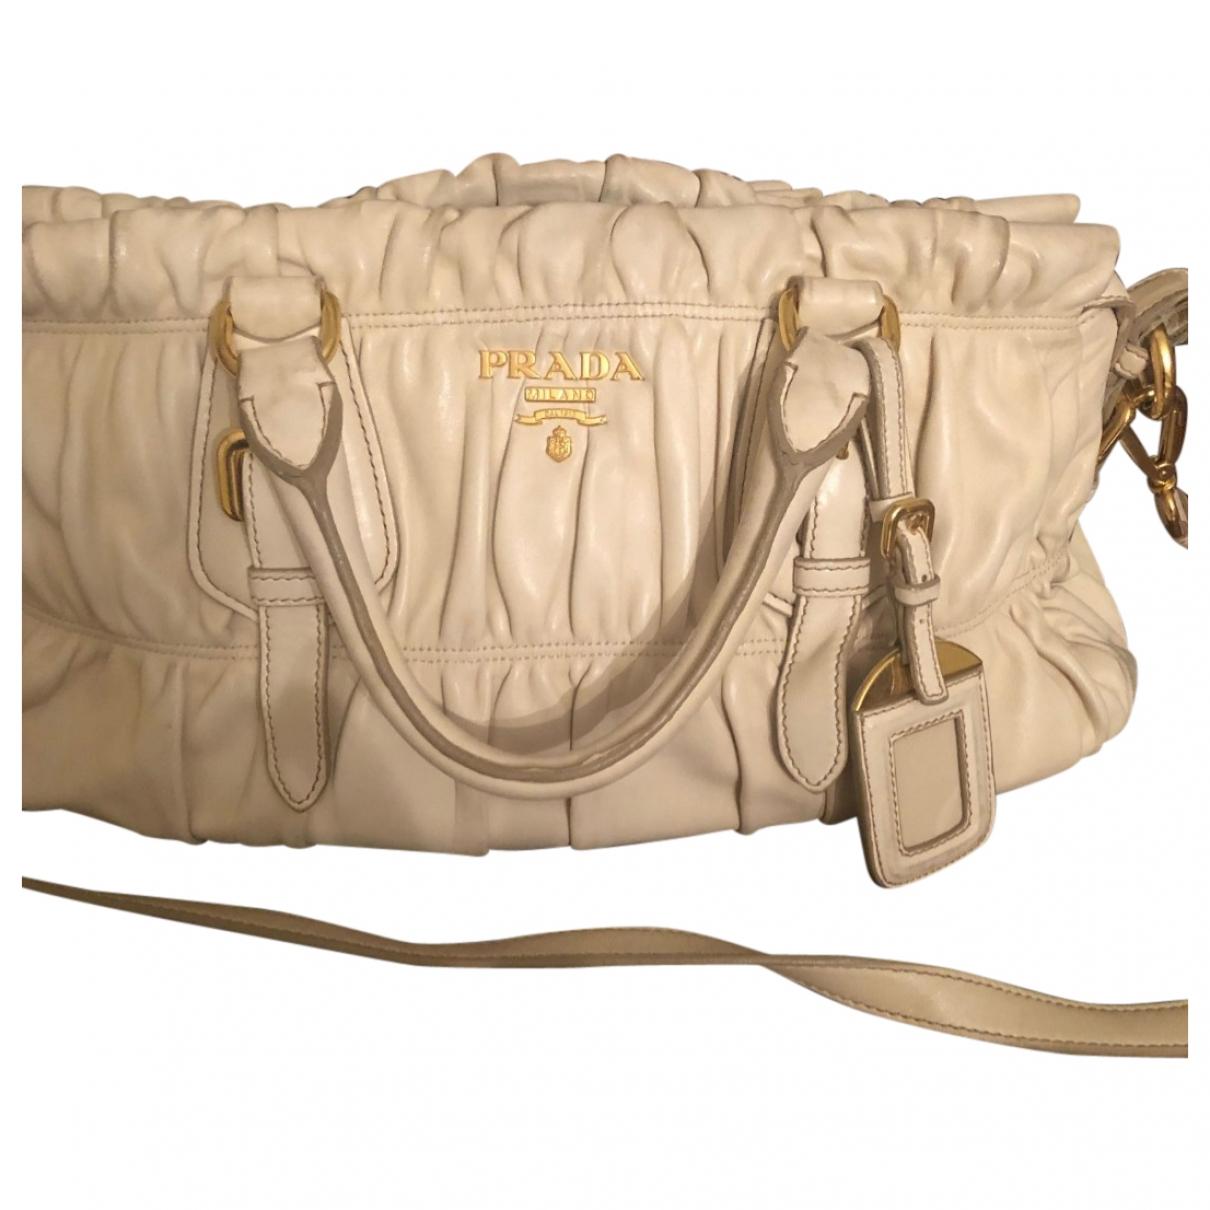 Prada \N Handtasche in  Beige Leder